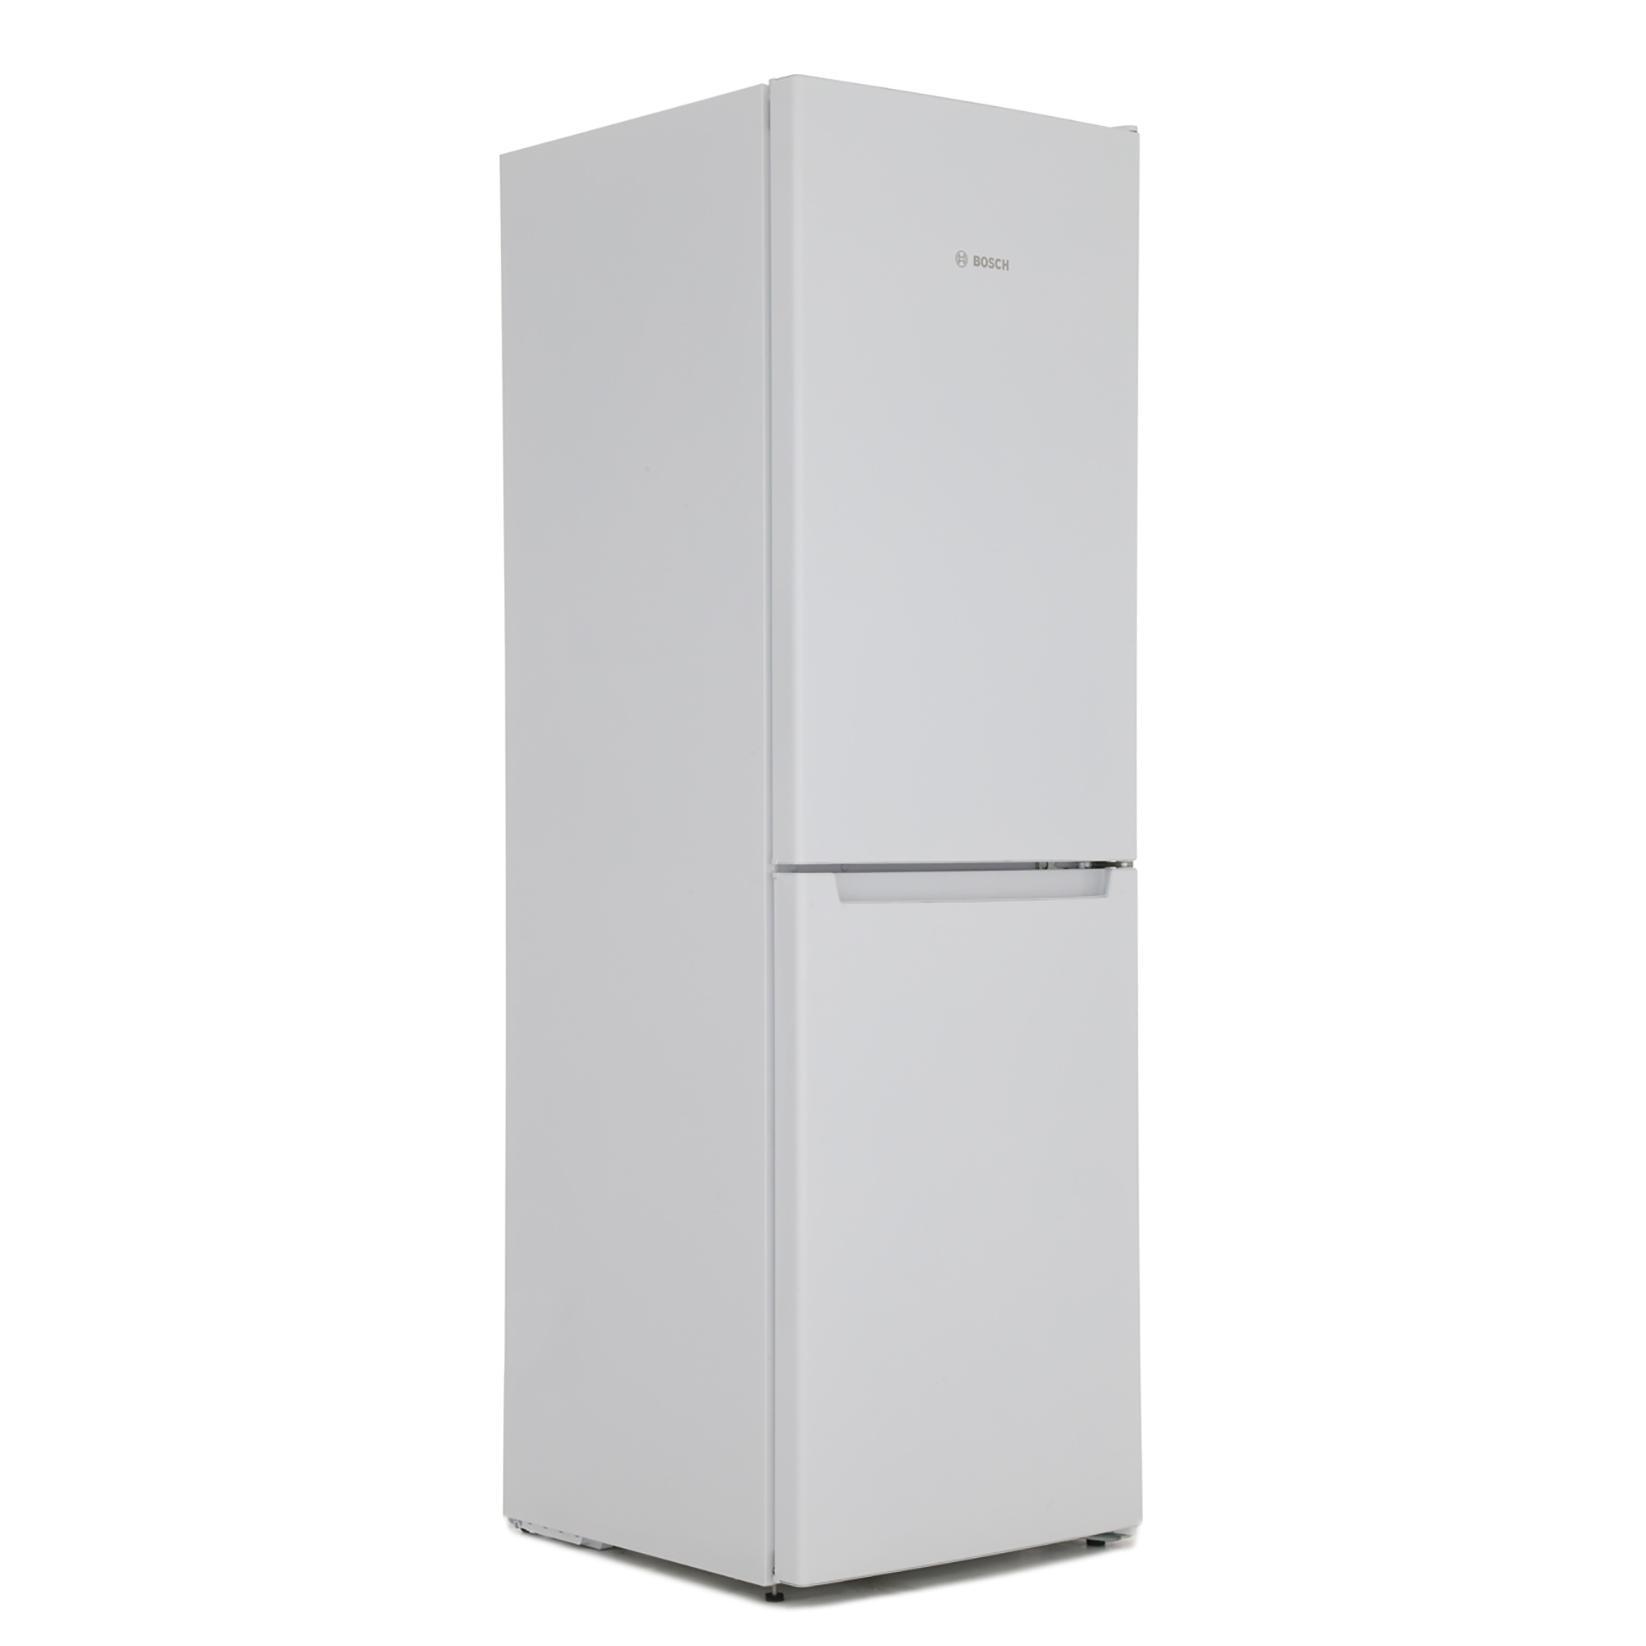 Bosch Serie 2 KGN34NW3AG Frost Free Fridge Freezer